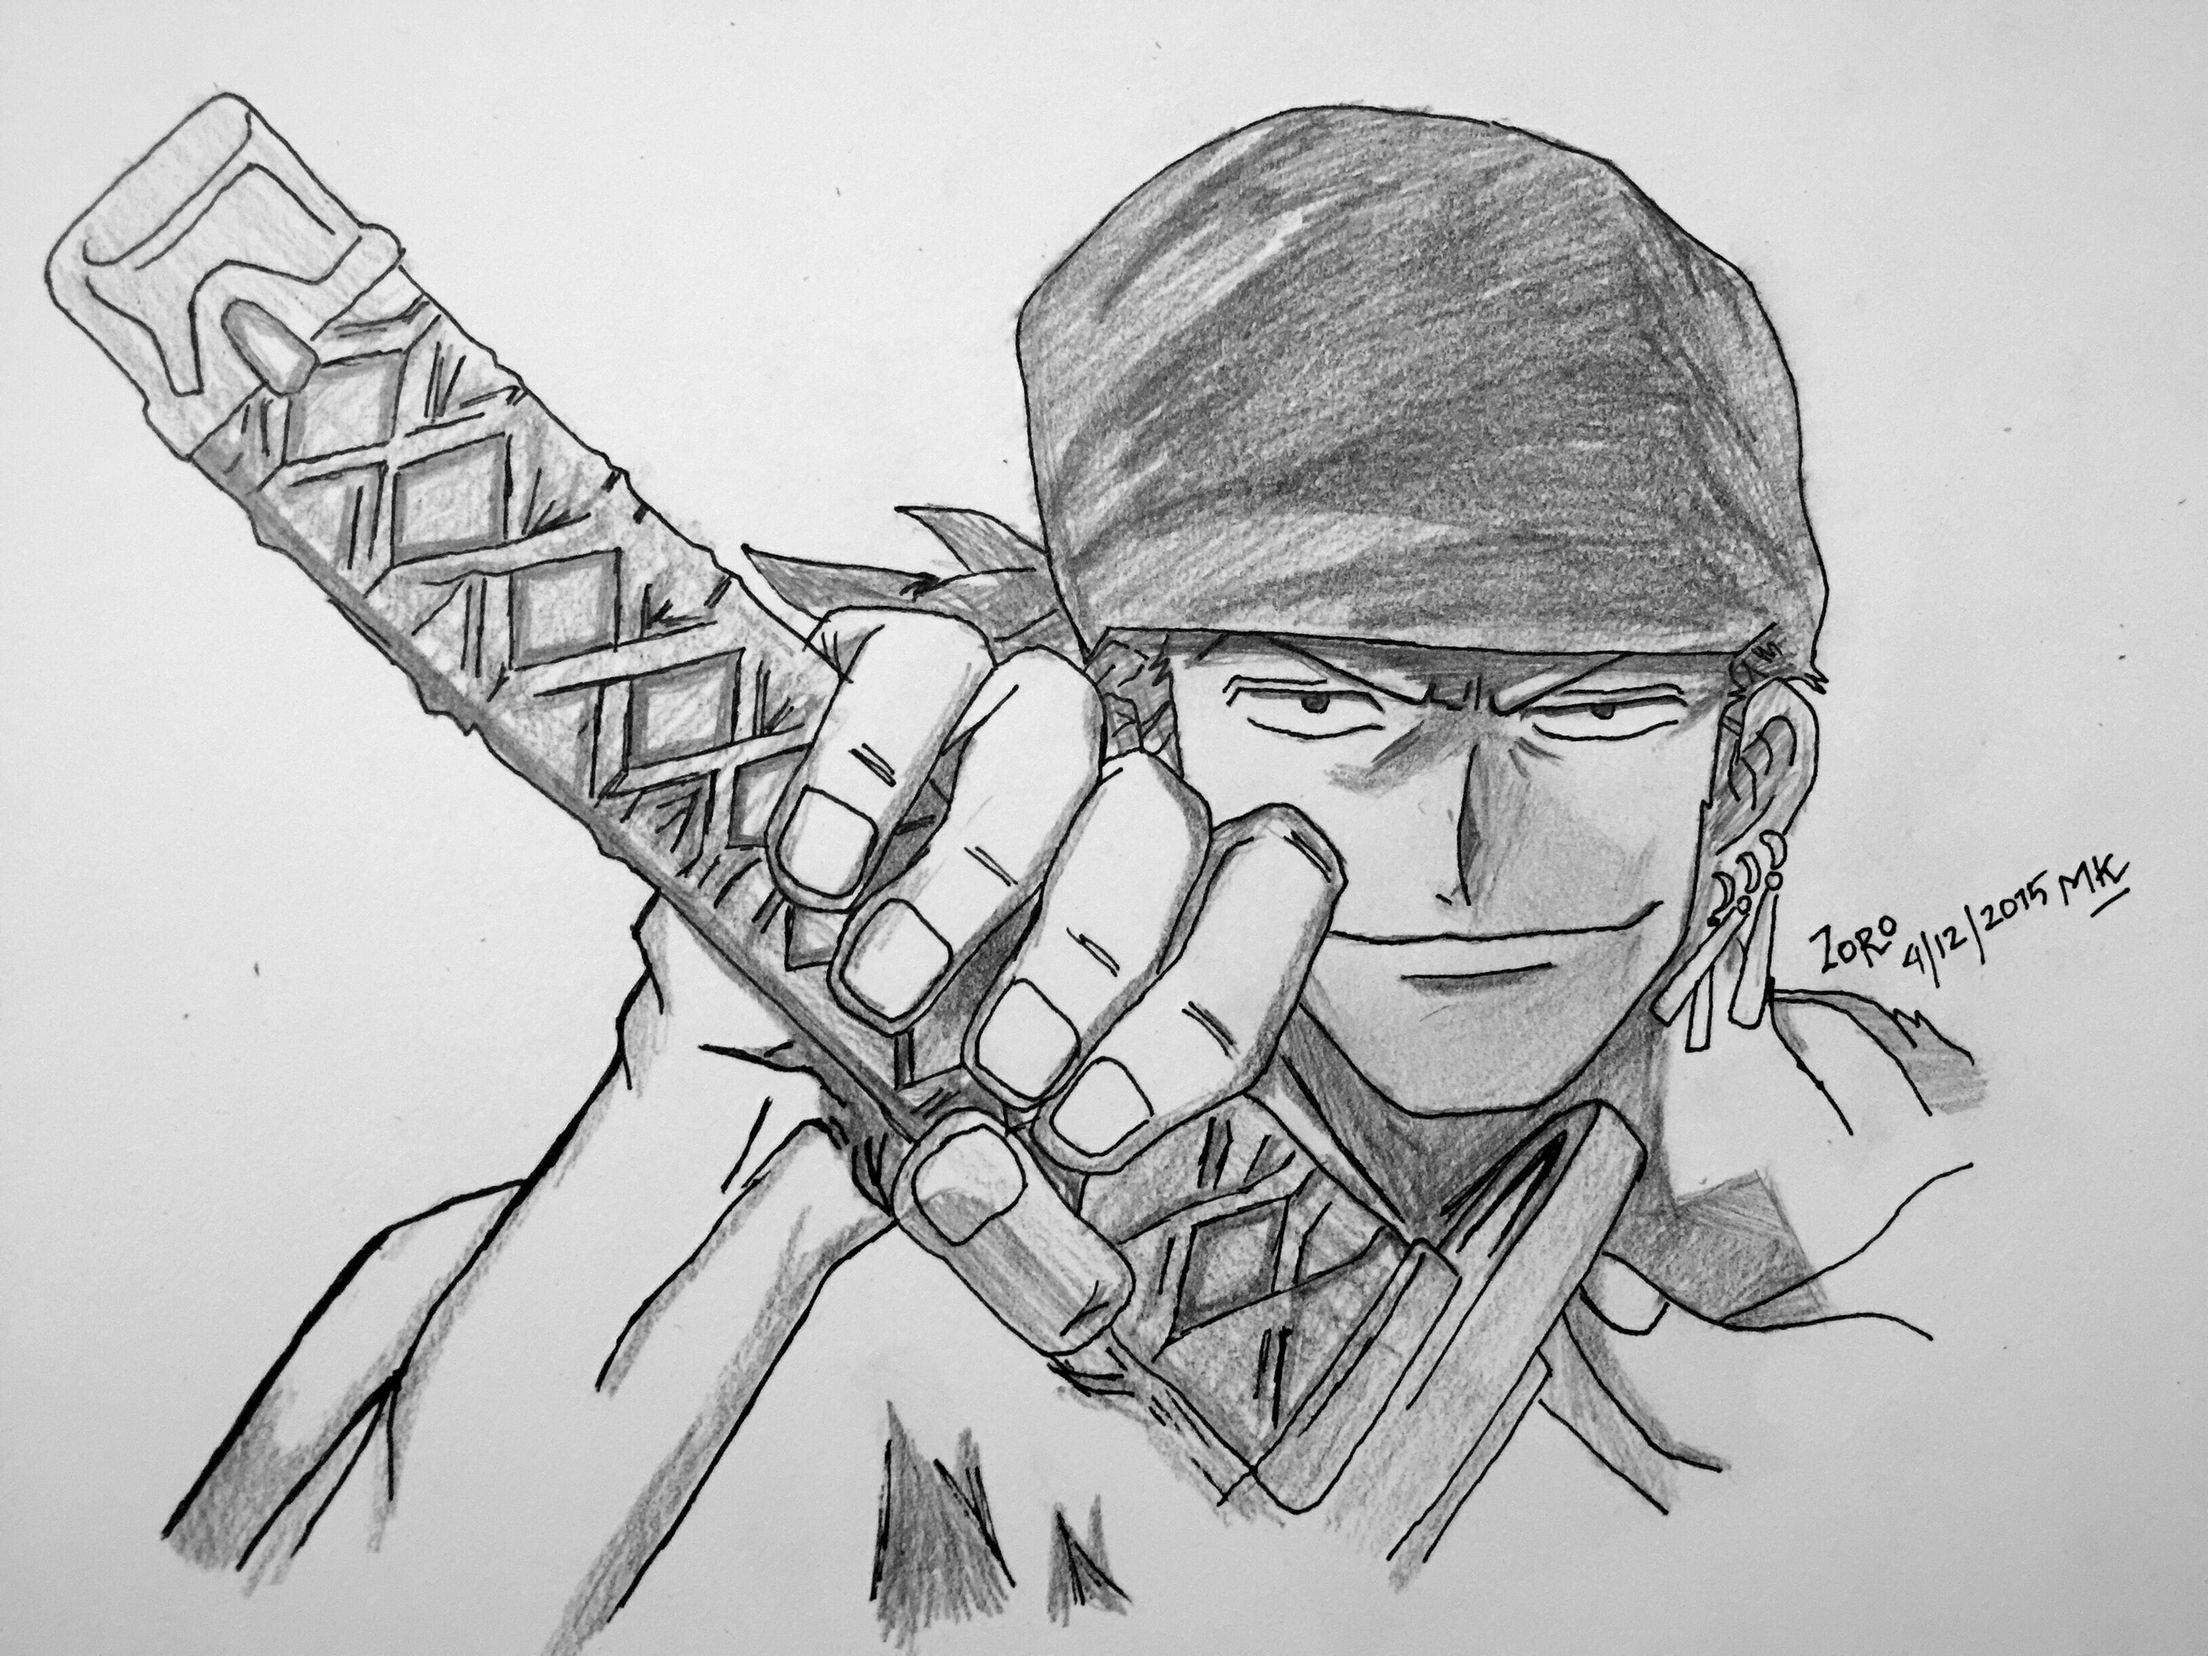 One Piece Zoro Anime Onepiece Drawing Drawings Art Anime